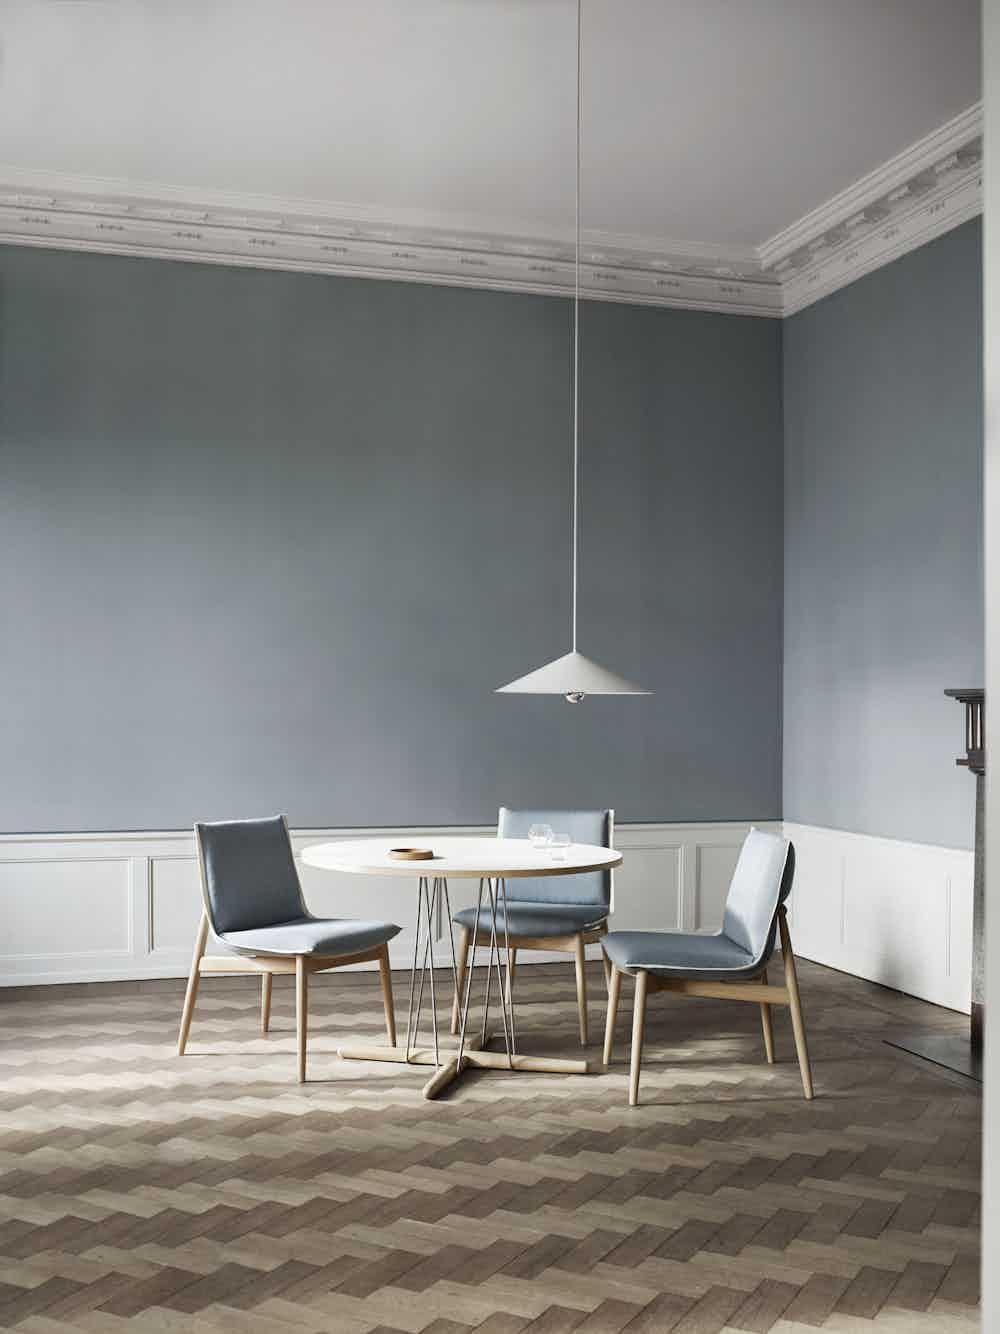 Carl-hansen-and-son-e004-embrace-dining-chair-insitu-haute-living